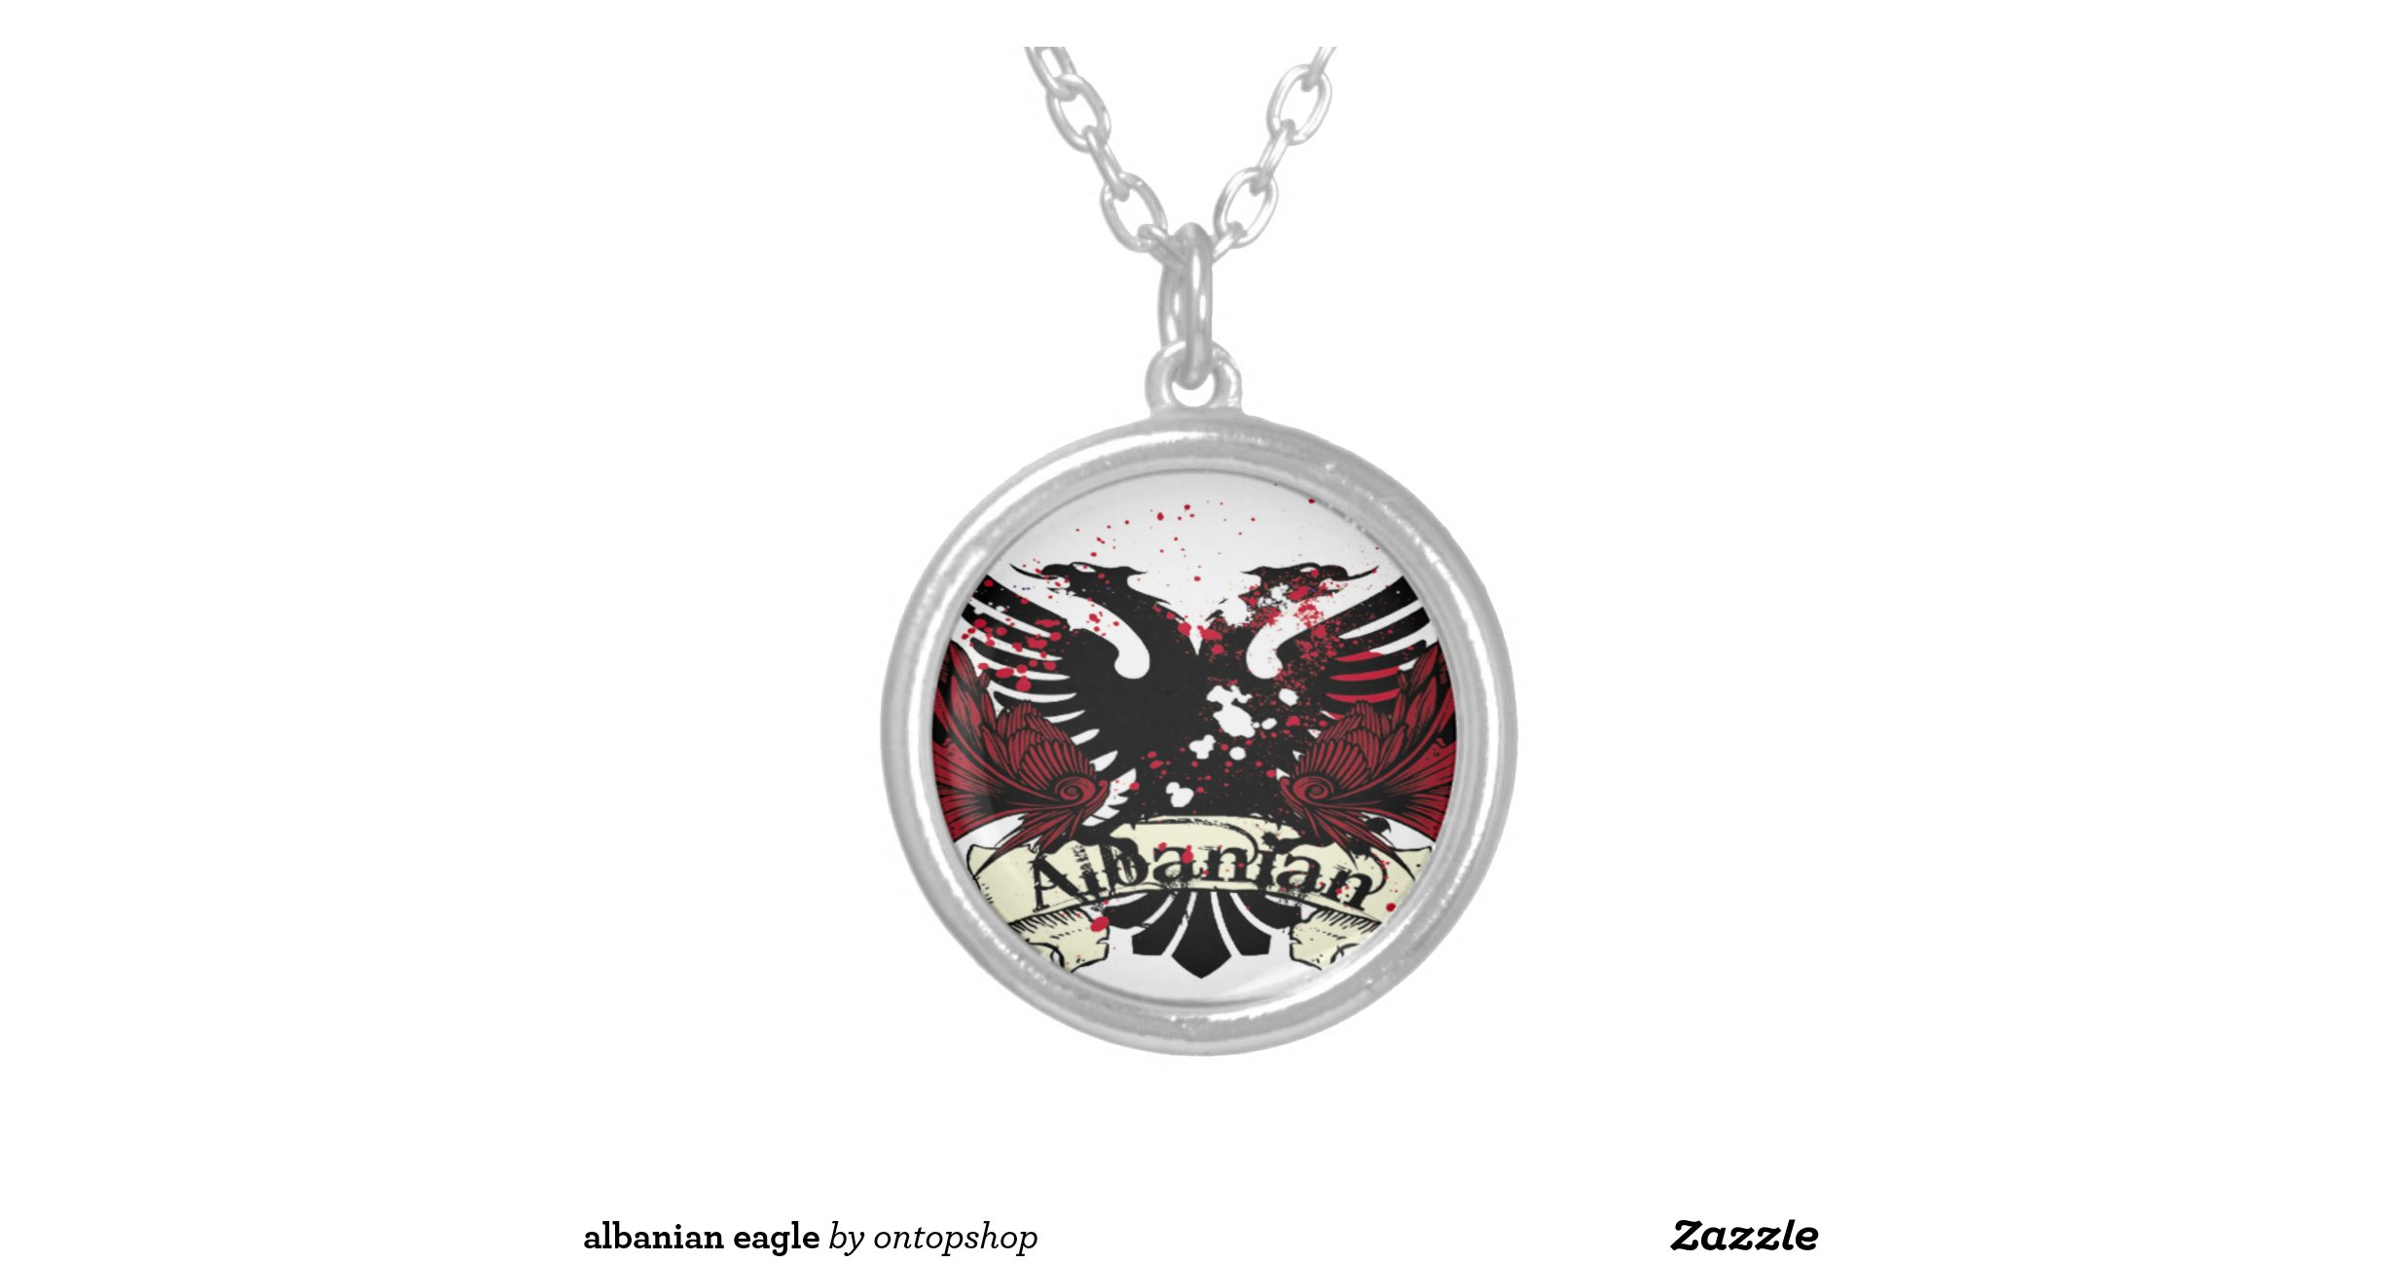 albanian eagle pendant necklace zazzle